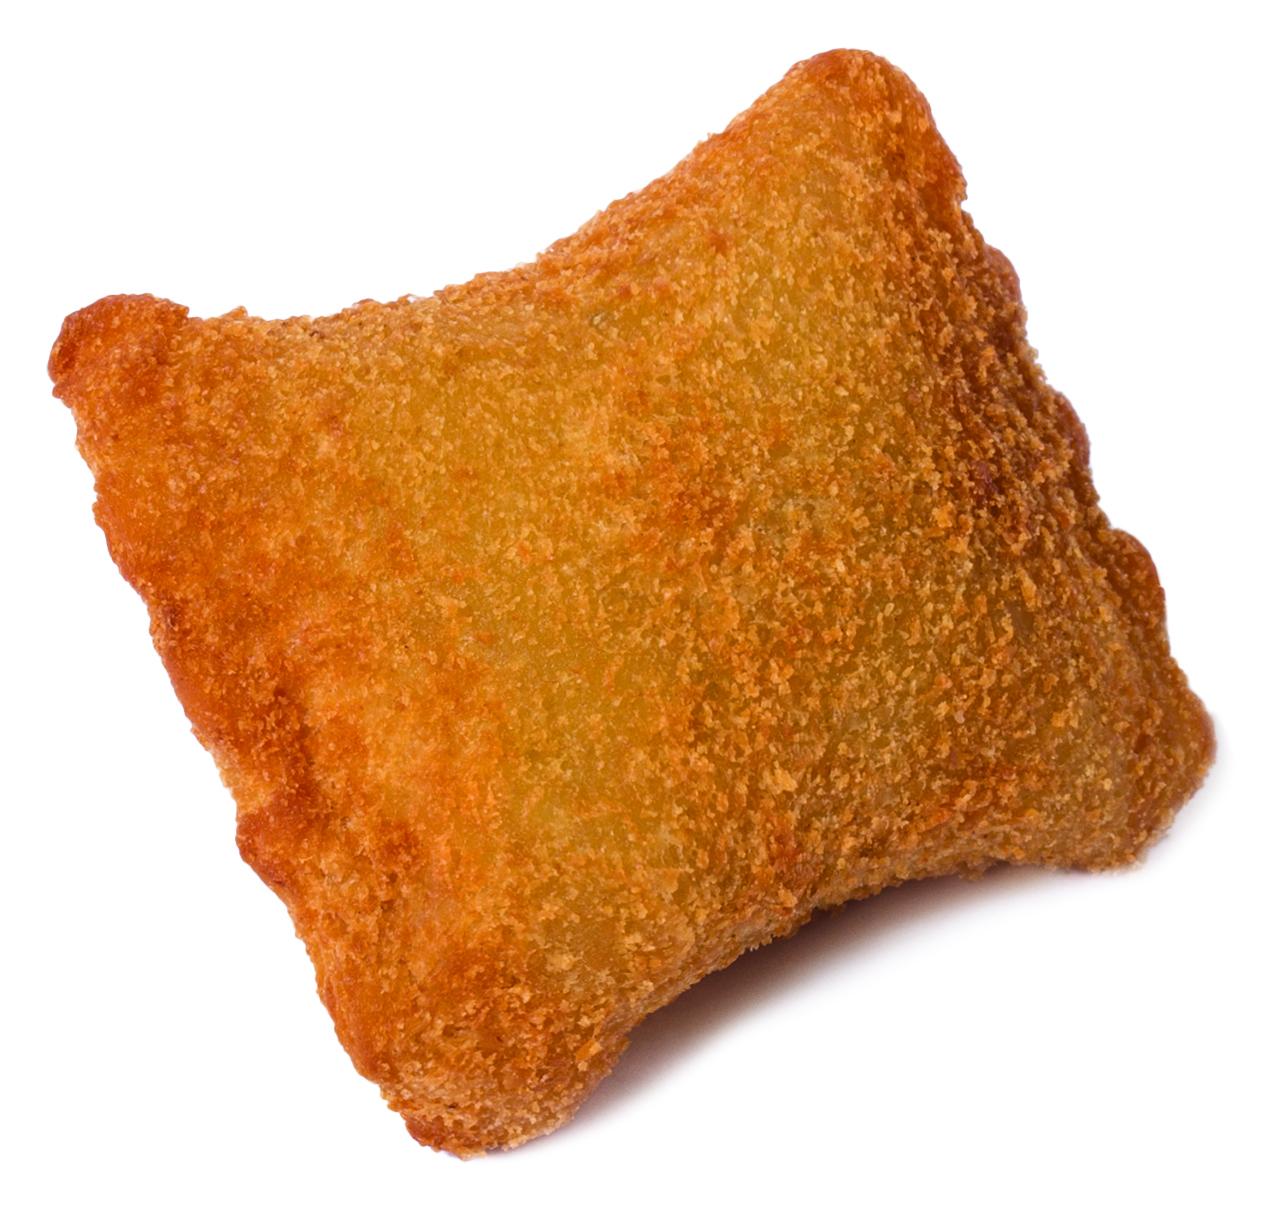 Coquetel - Fritos Coquetel (fritos) - Travesseiro de Presunto e Queijo